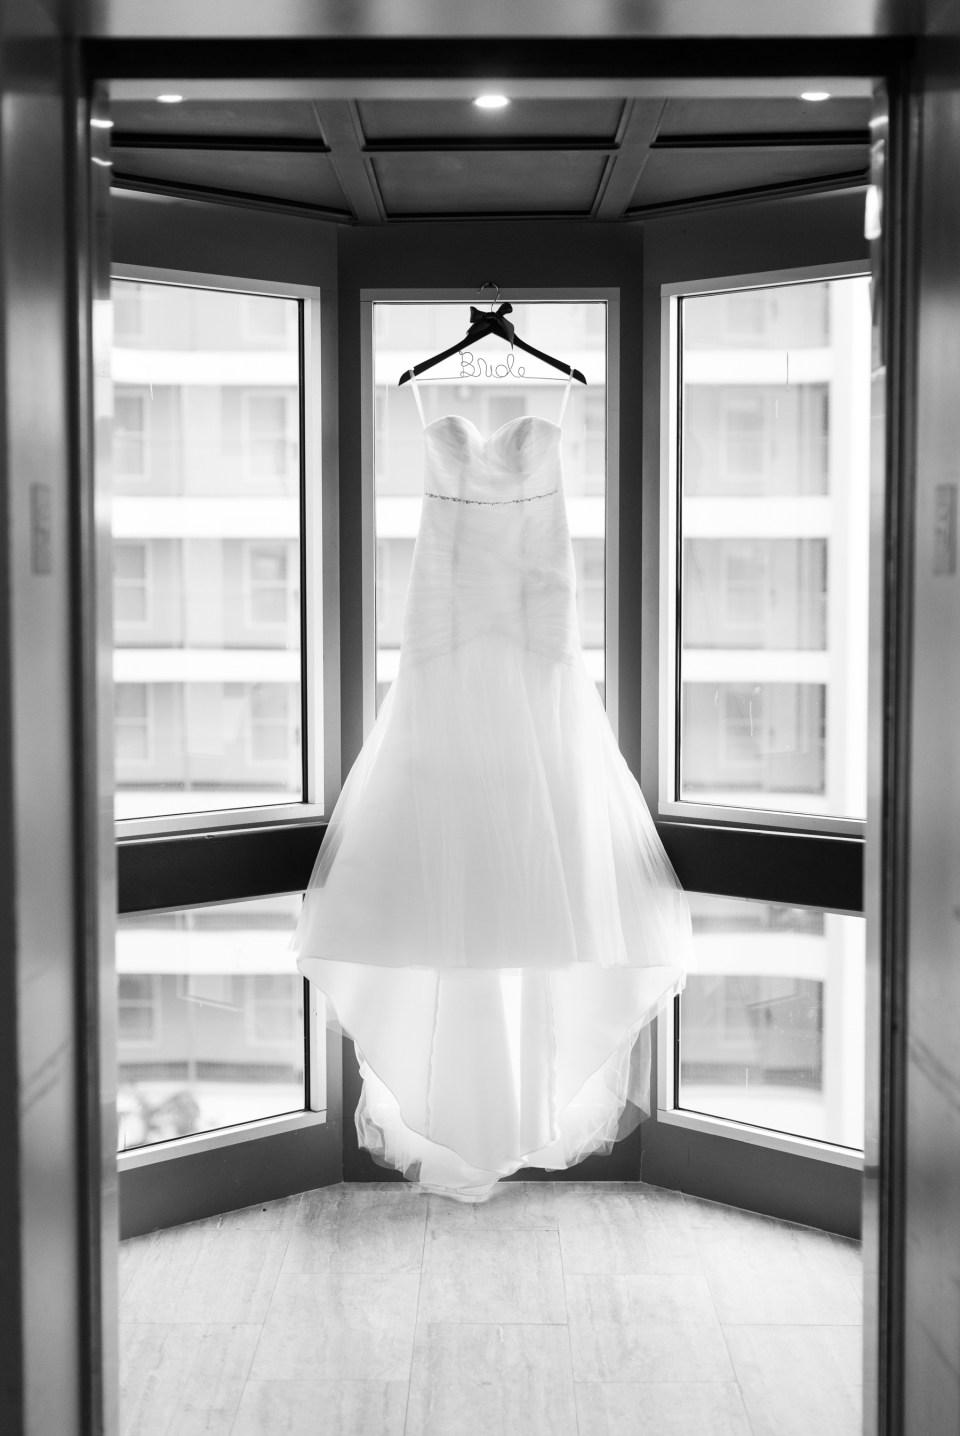 Black and White Photo of Wedding Dress Hanging UP